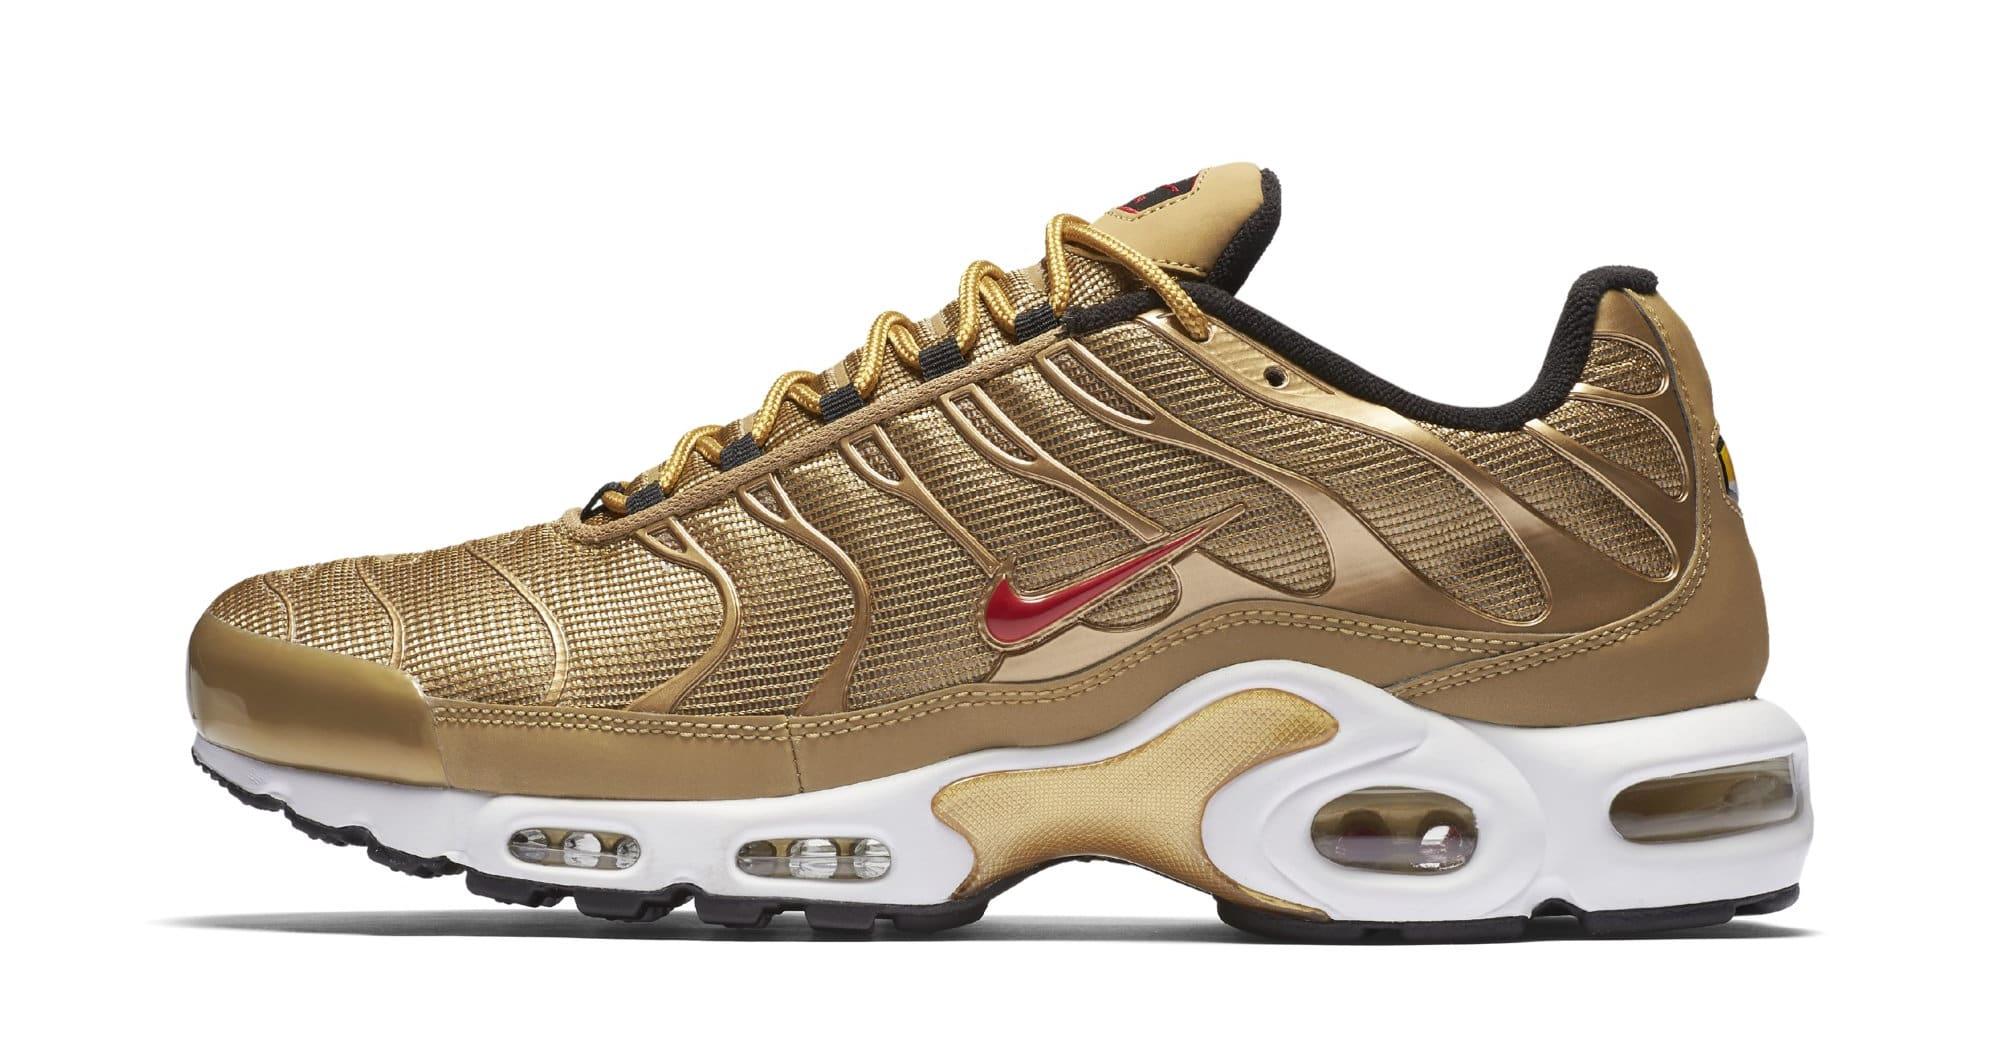 Nike Air Max Plus 'Metallic Gold' 903827-700 (Lateral)